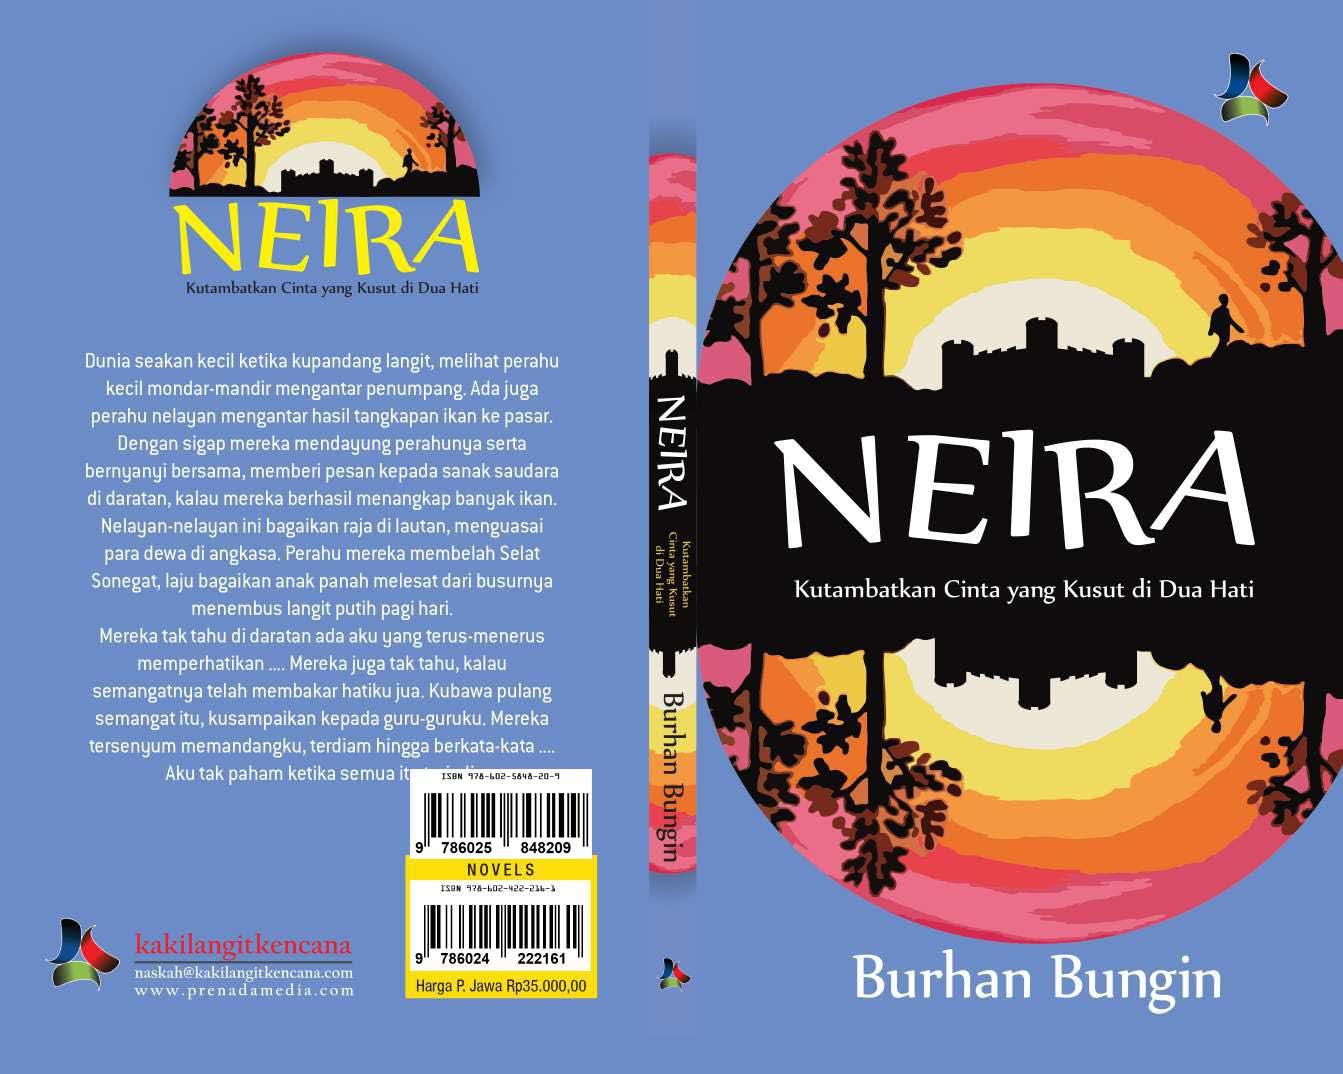 Neira: kutambatkan cintaku yang kusut di dua hati [sumber elektronis]